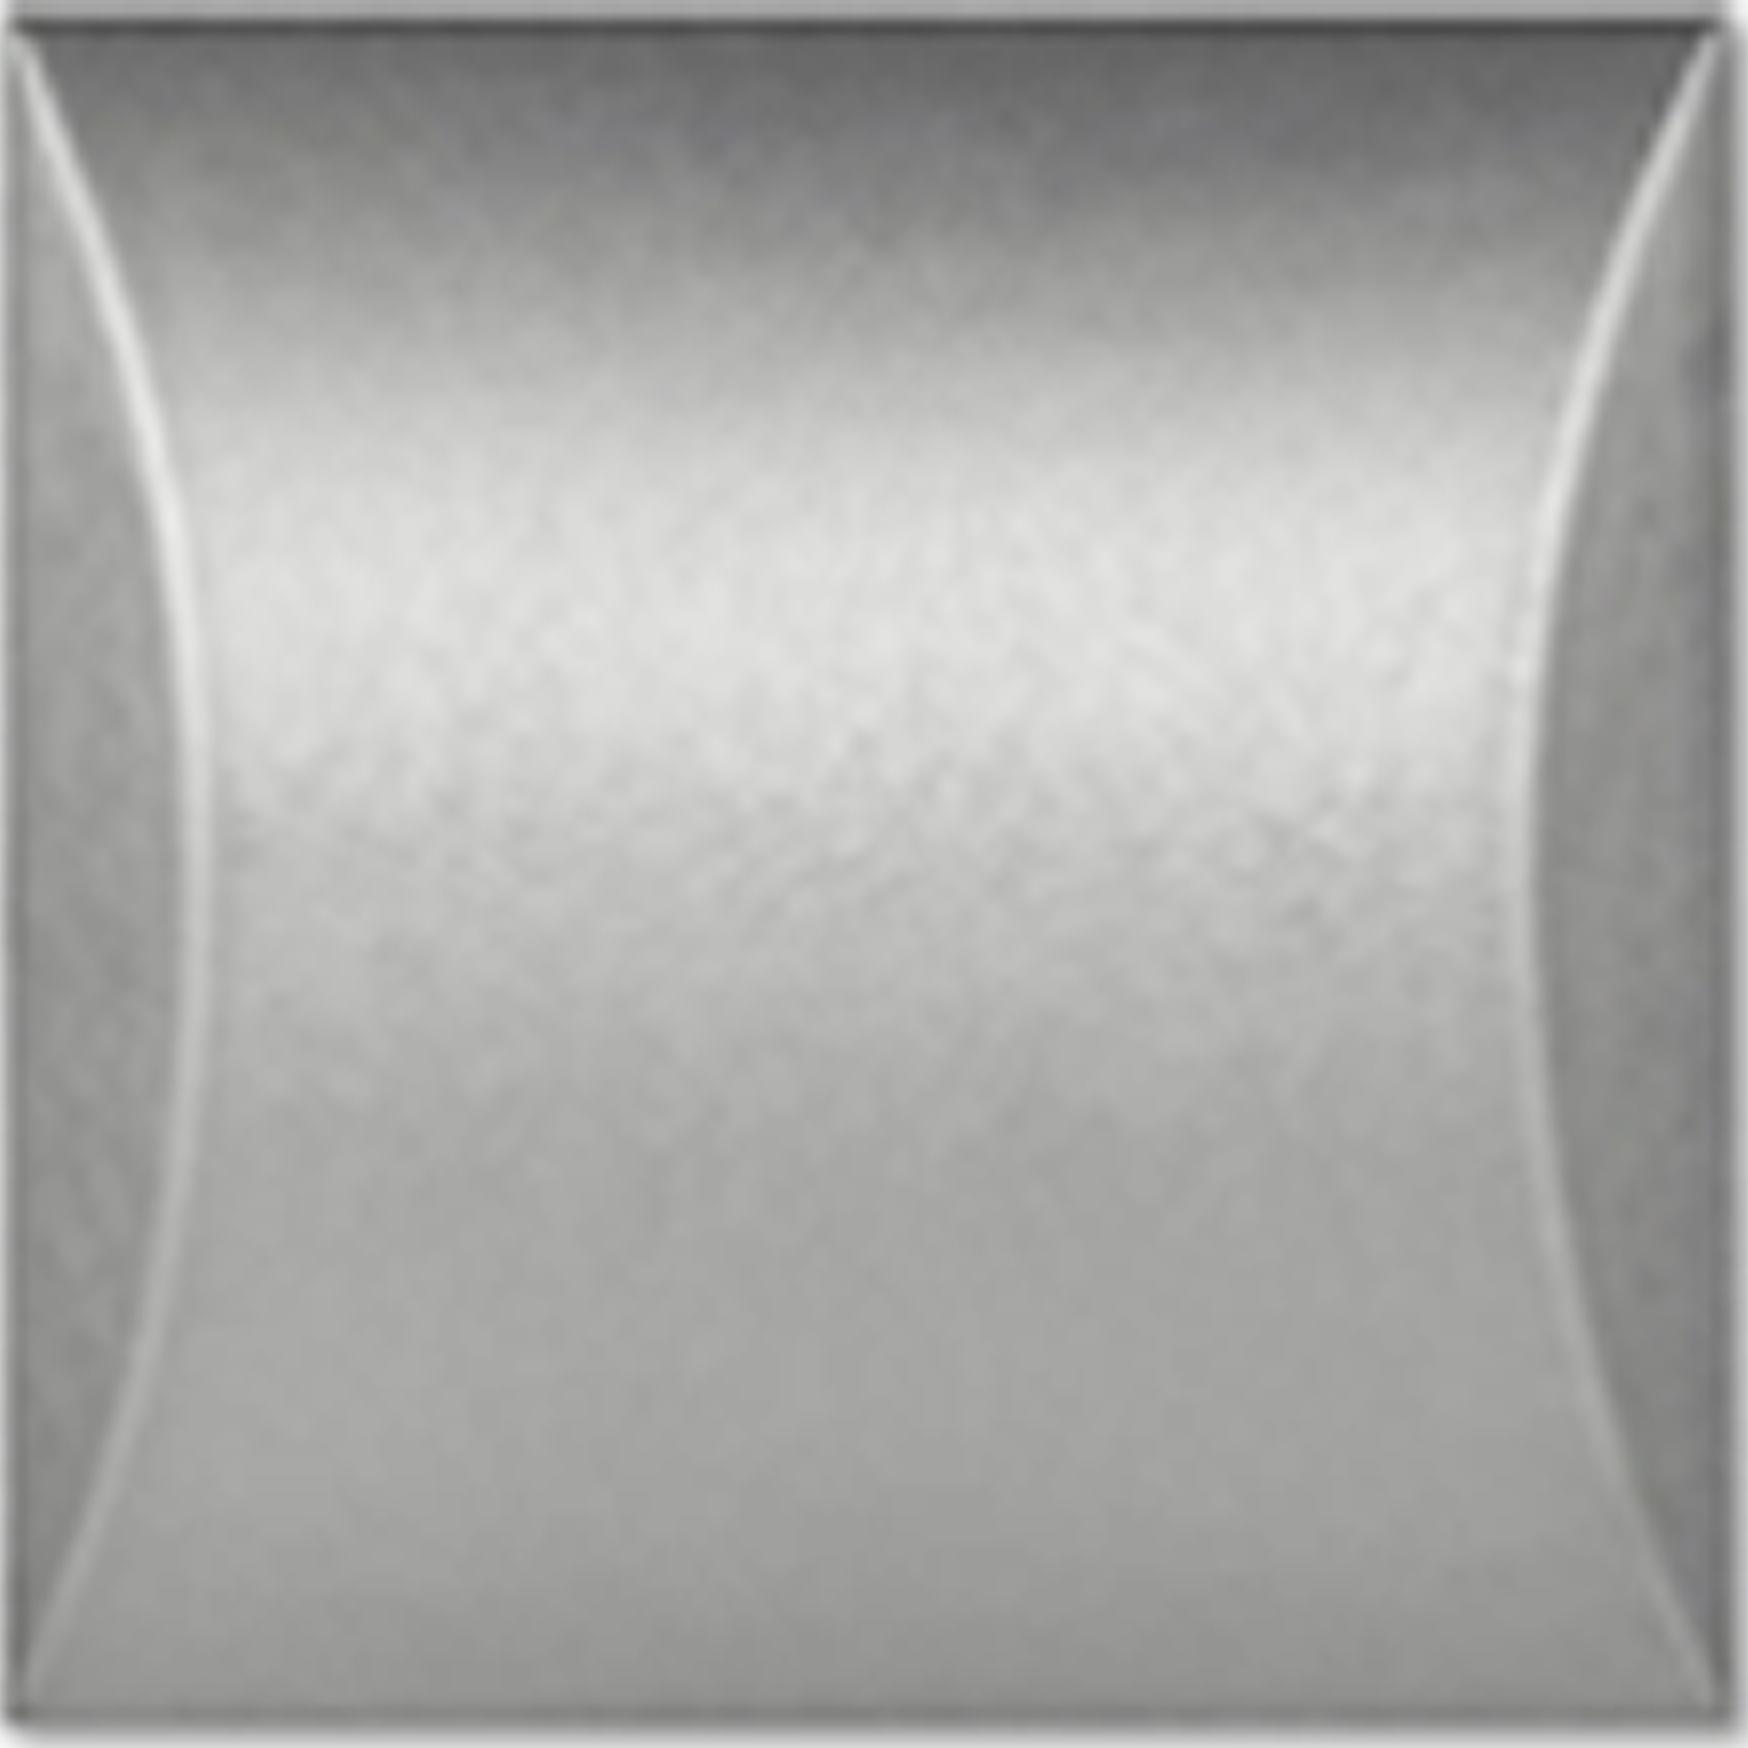 Bend Acero 14.8x14.8 cm